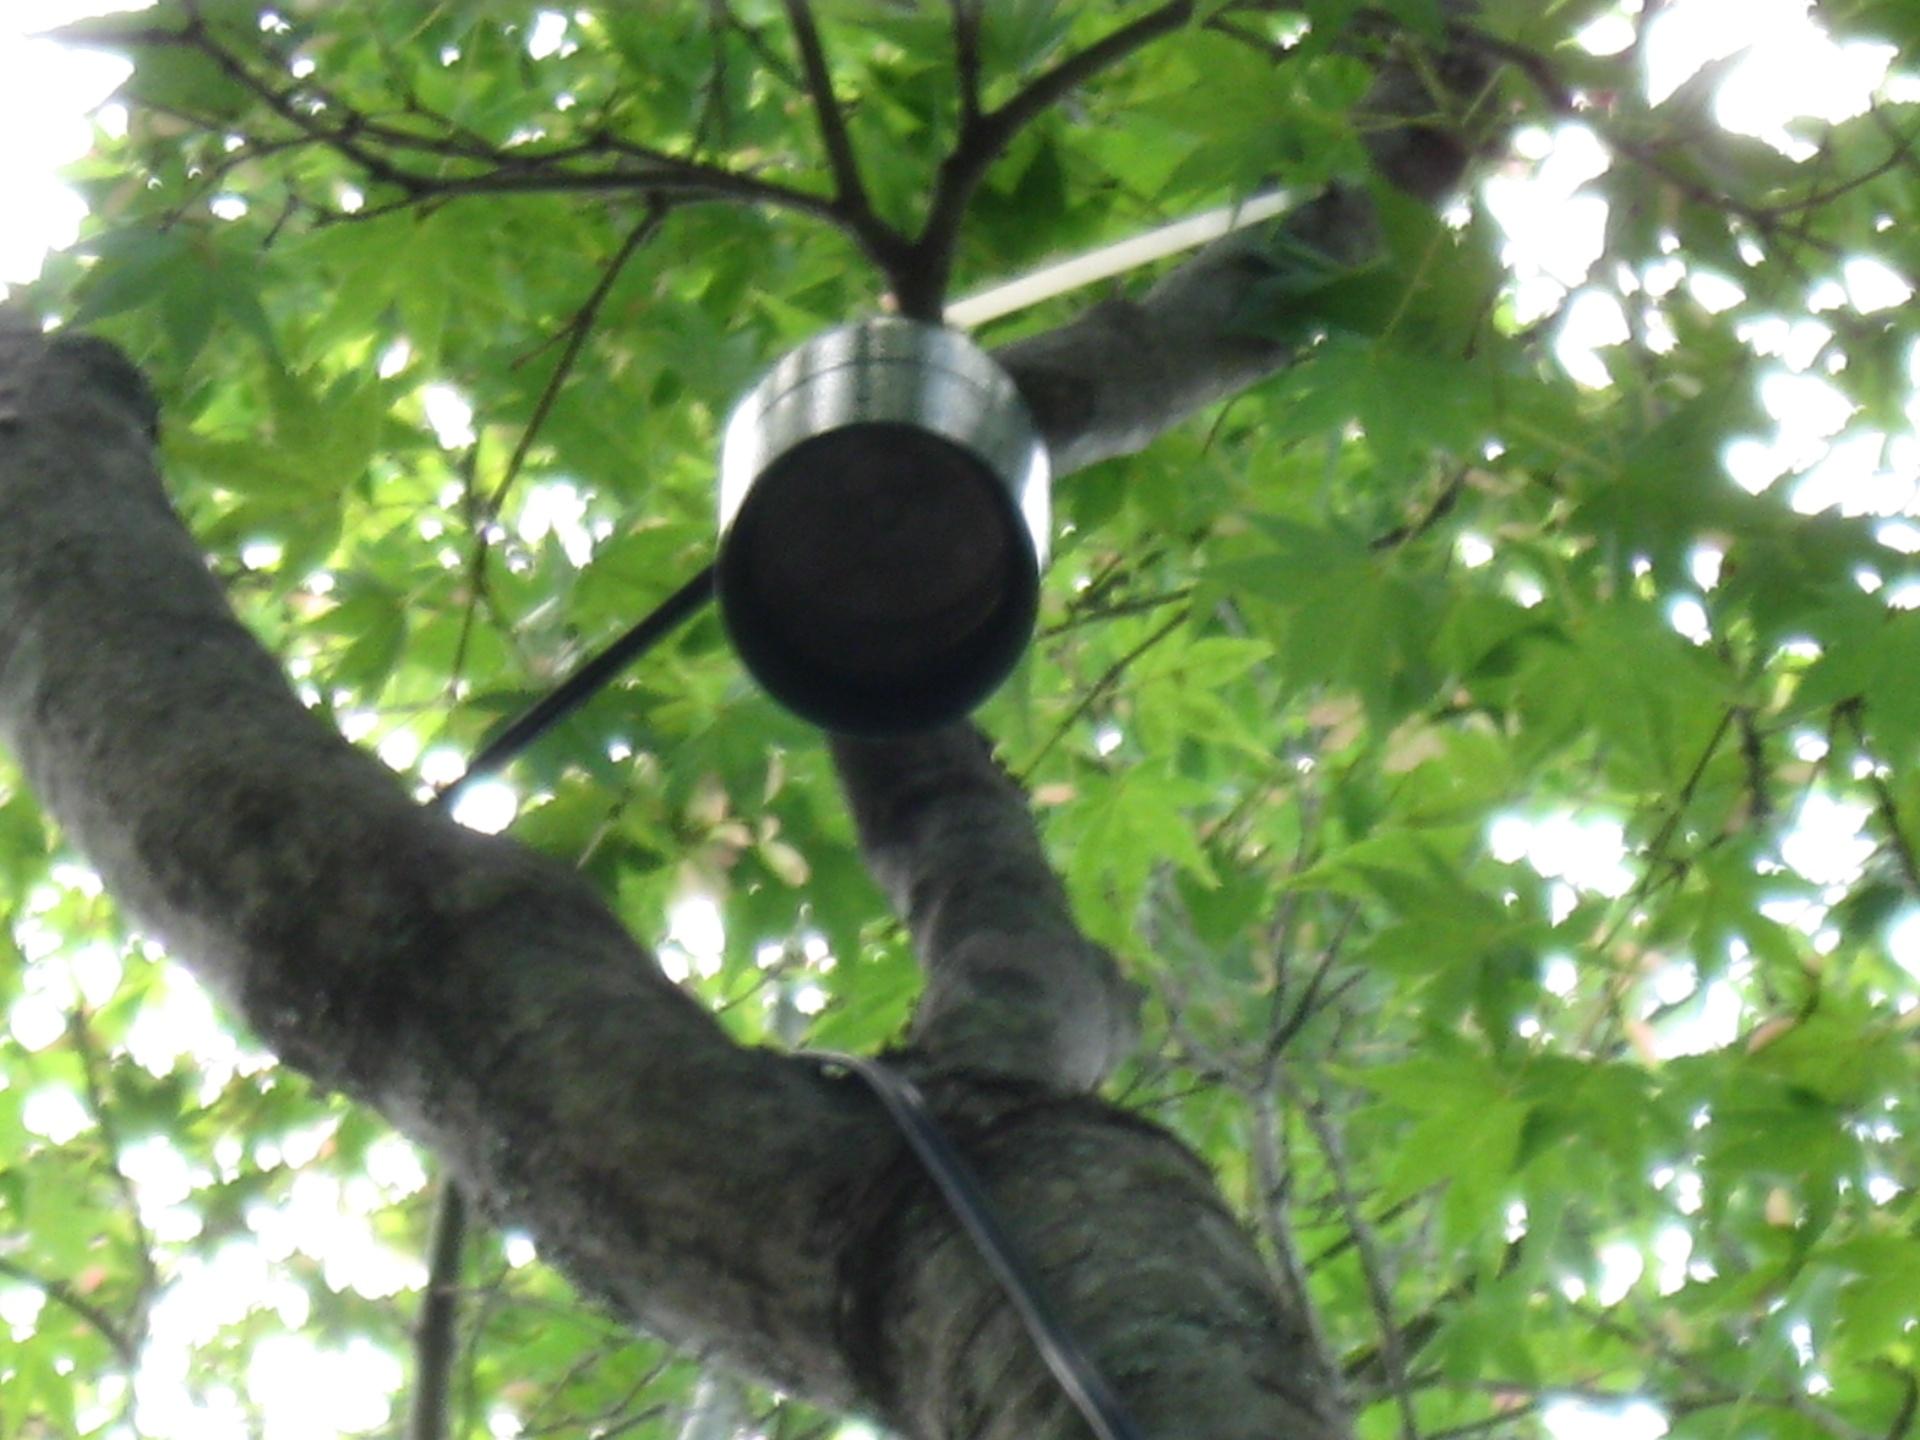 TREE DOWN LIGHTING